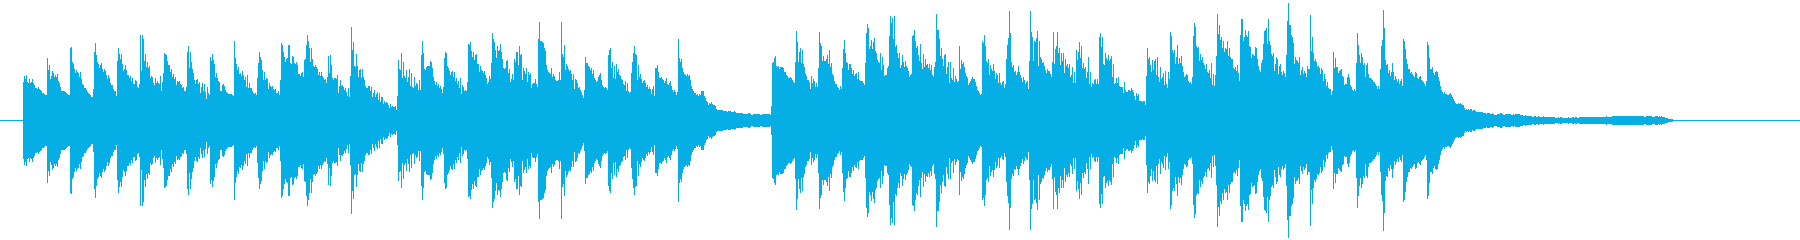 CM30秒、優しく感動的なピアノソロ13の再生済みの波形